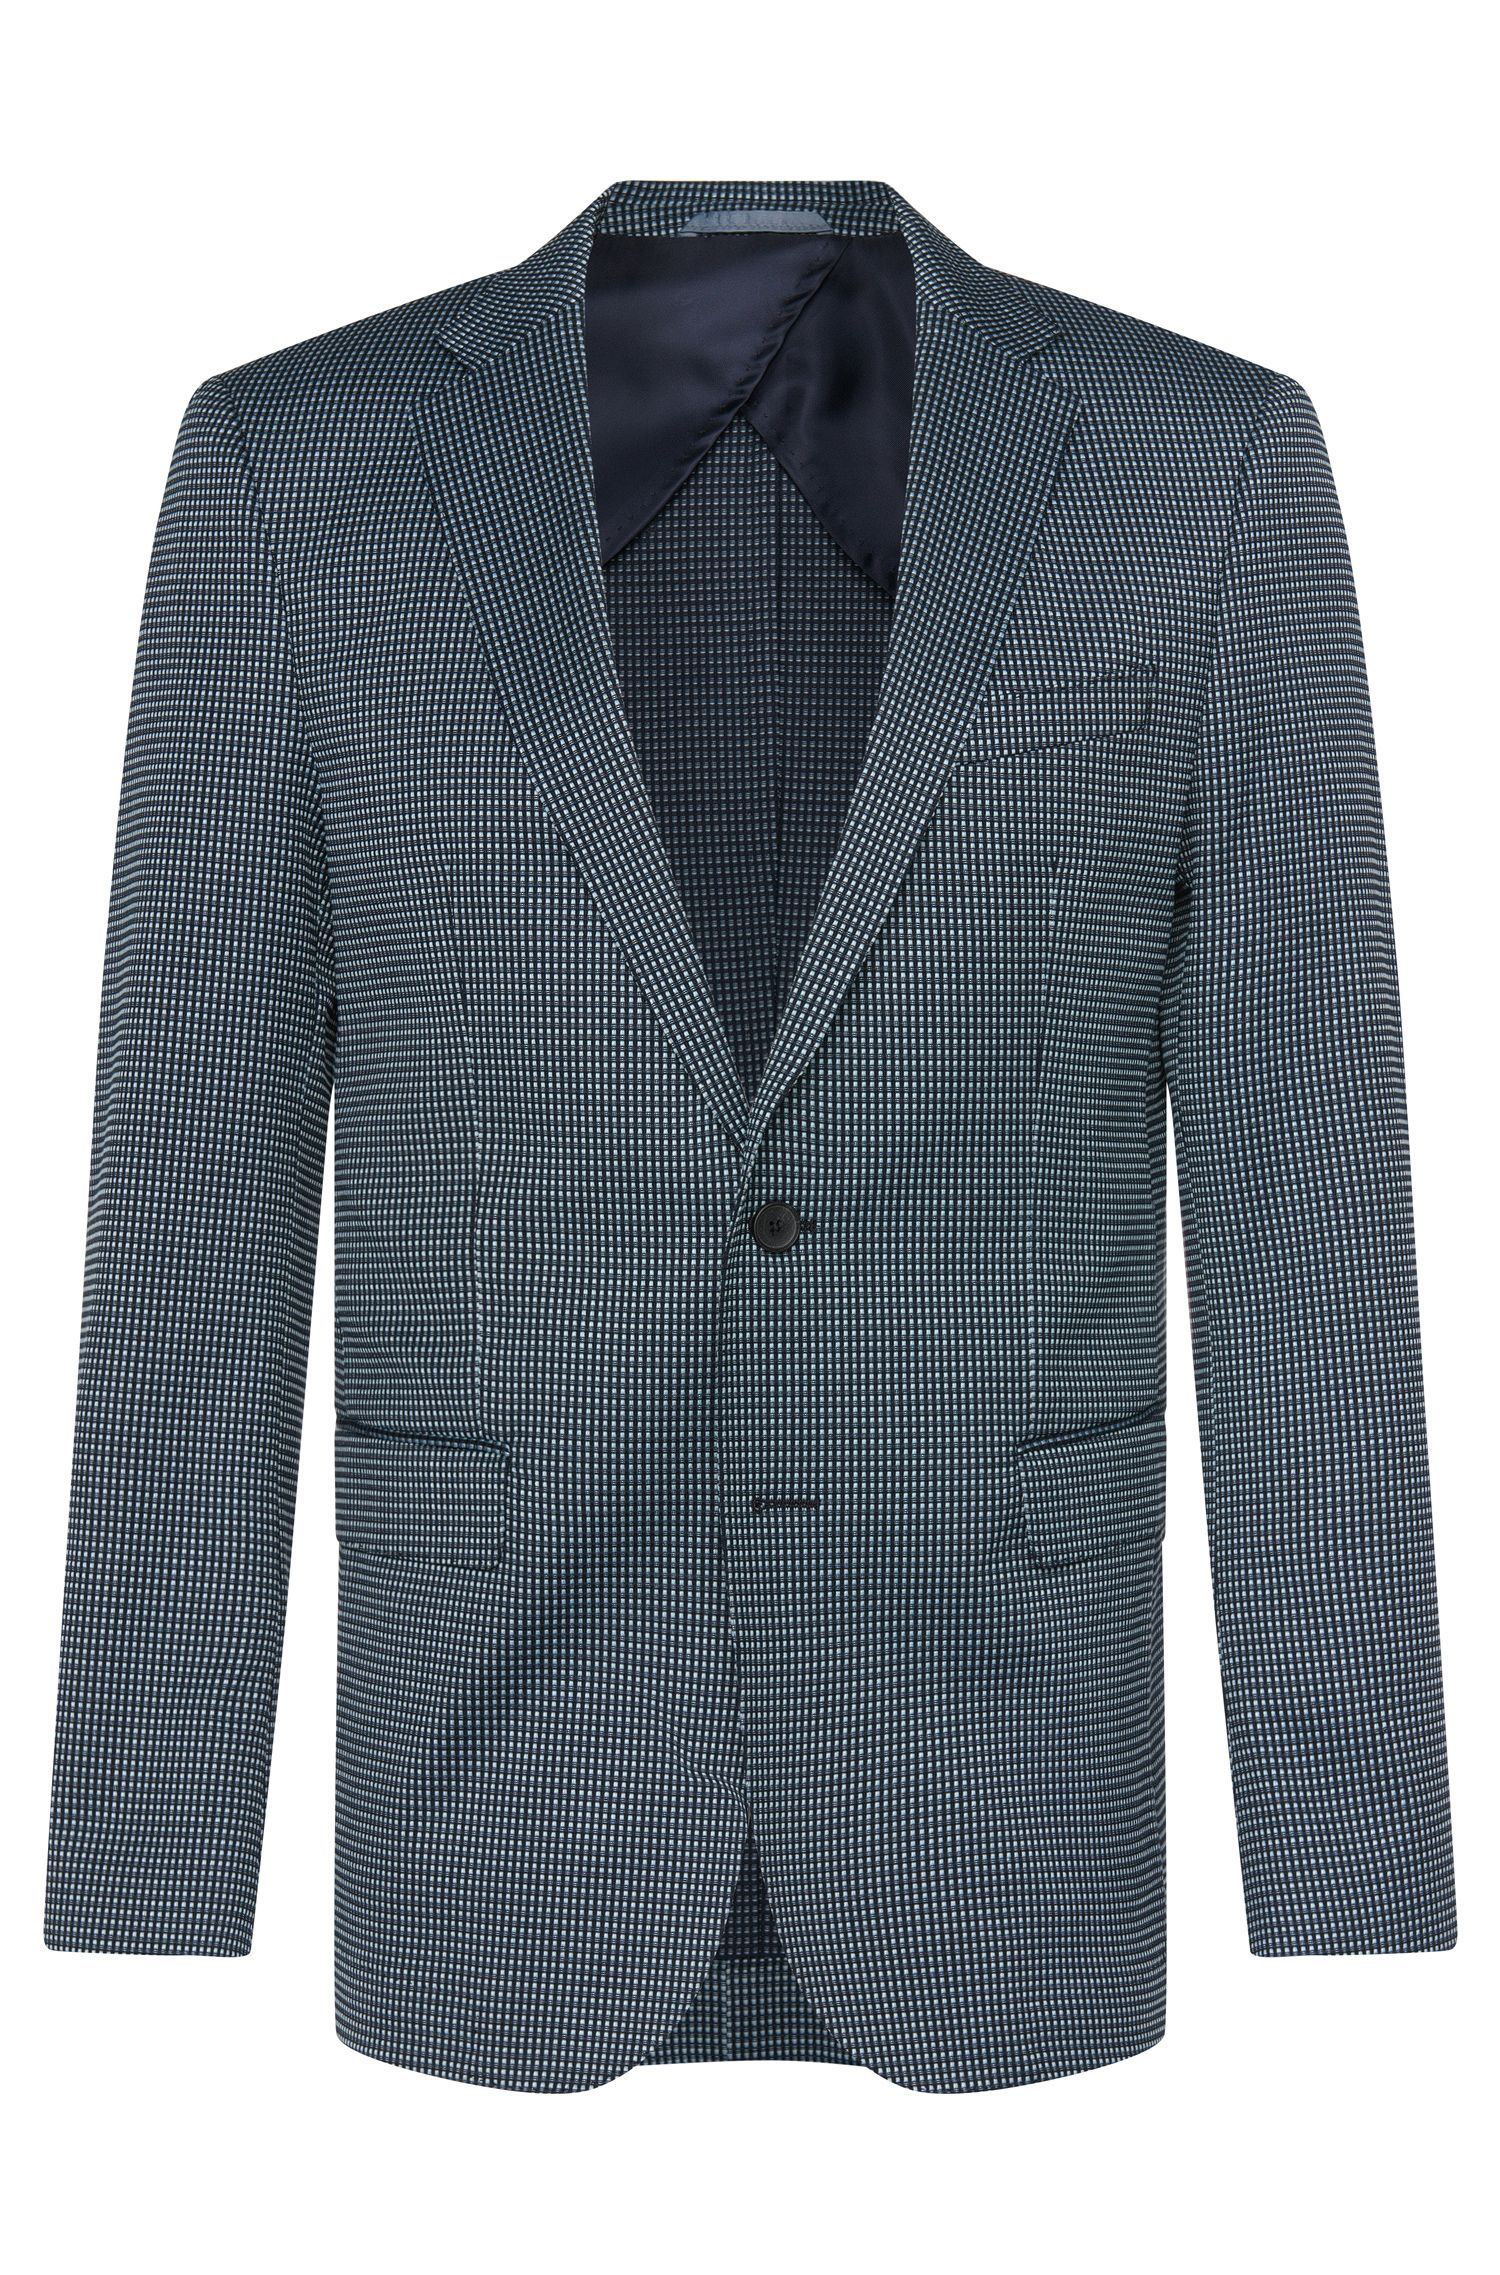 Stretch Cotton Blend Patterned Sport Coat, Slim Fit   Nobis